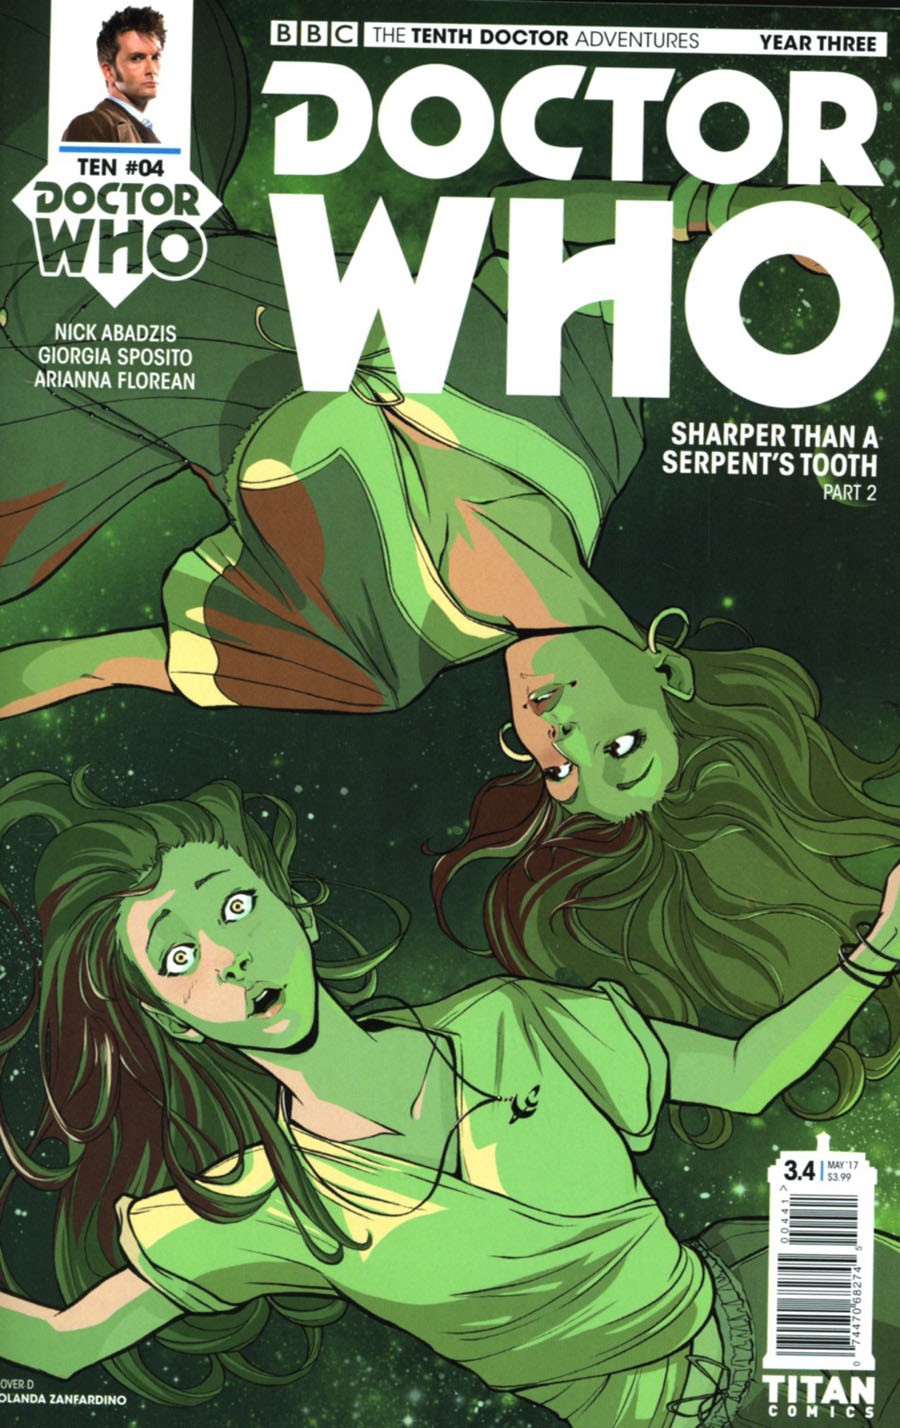 Doctor Who 10th Doctor Year Three #4 Cover D Variant Iolanda Zanfardino Cover